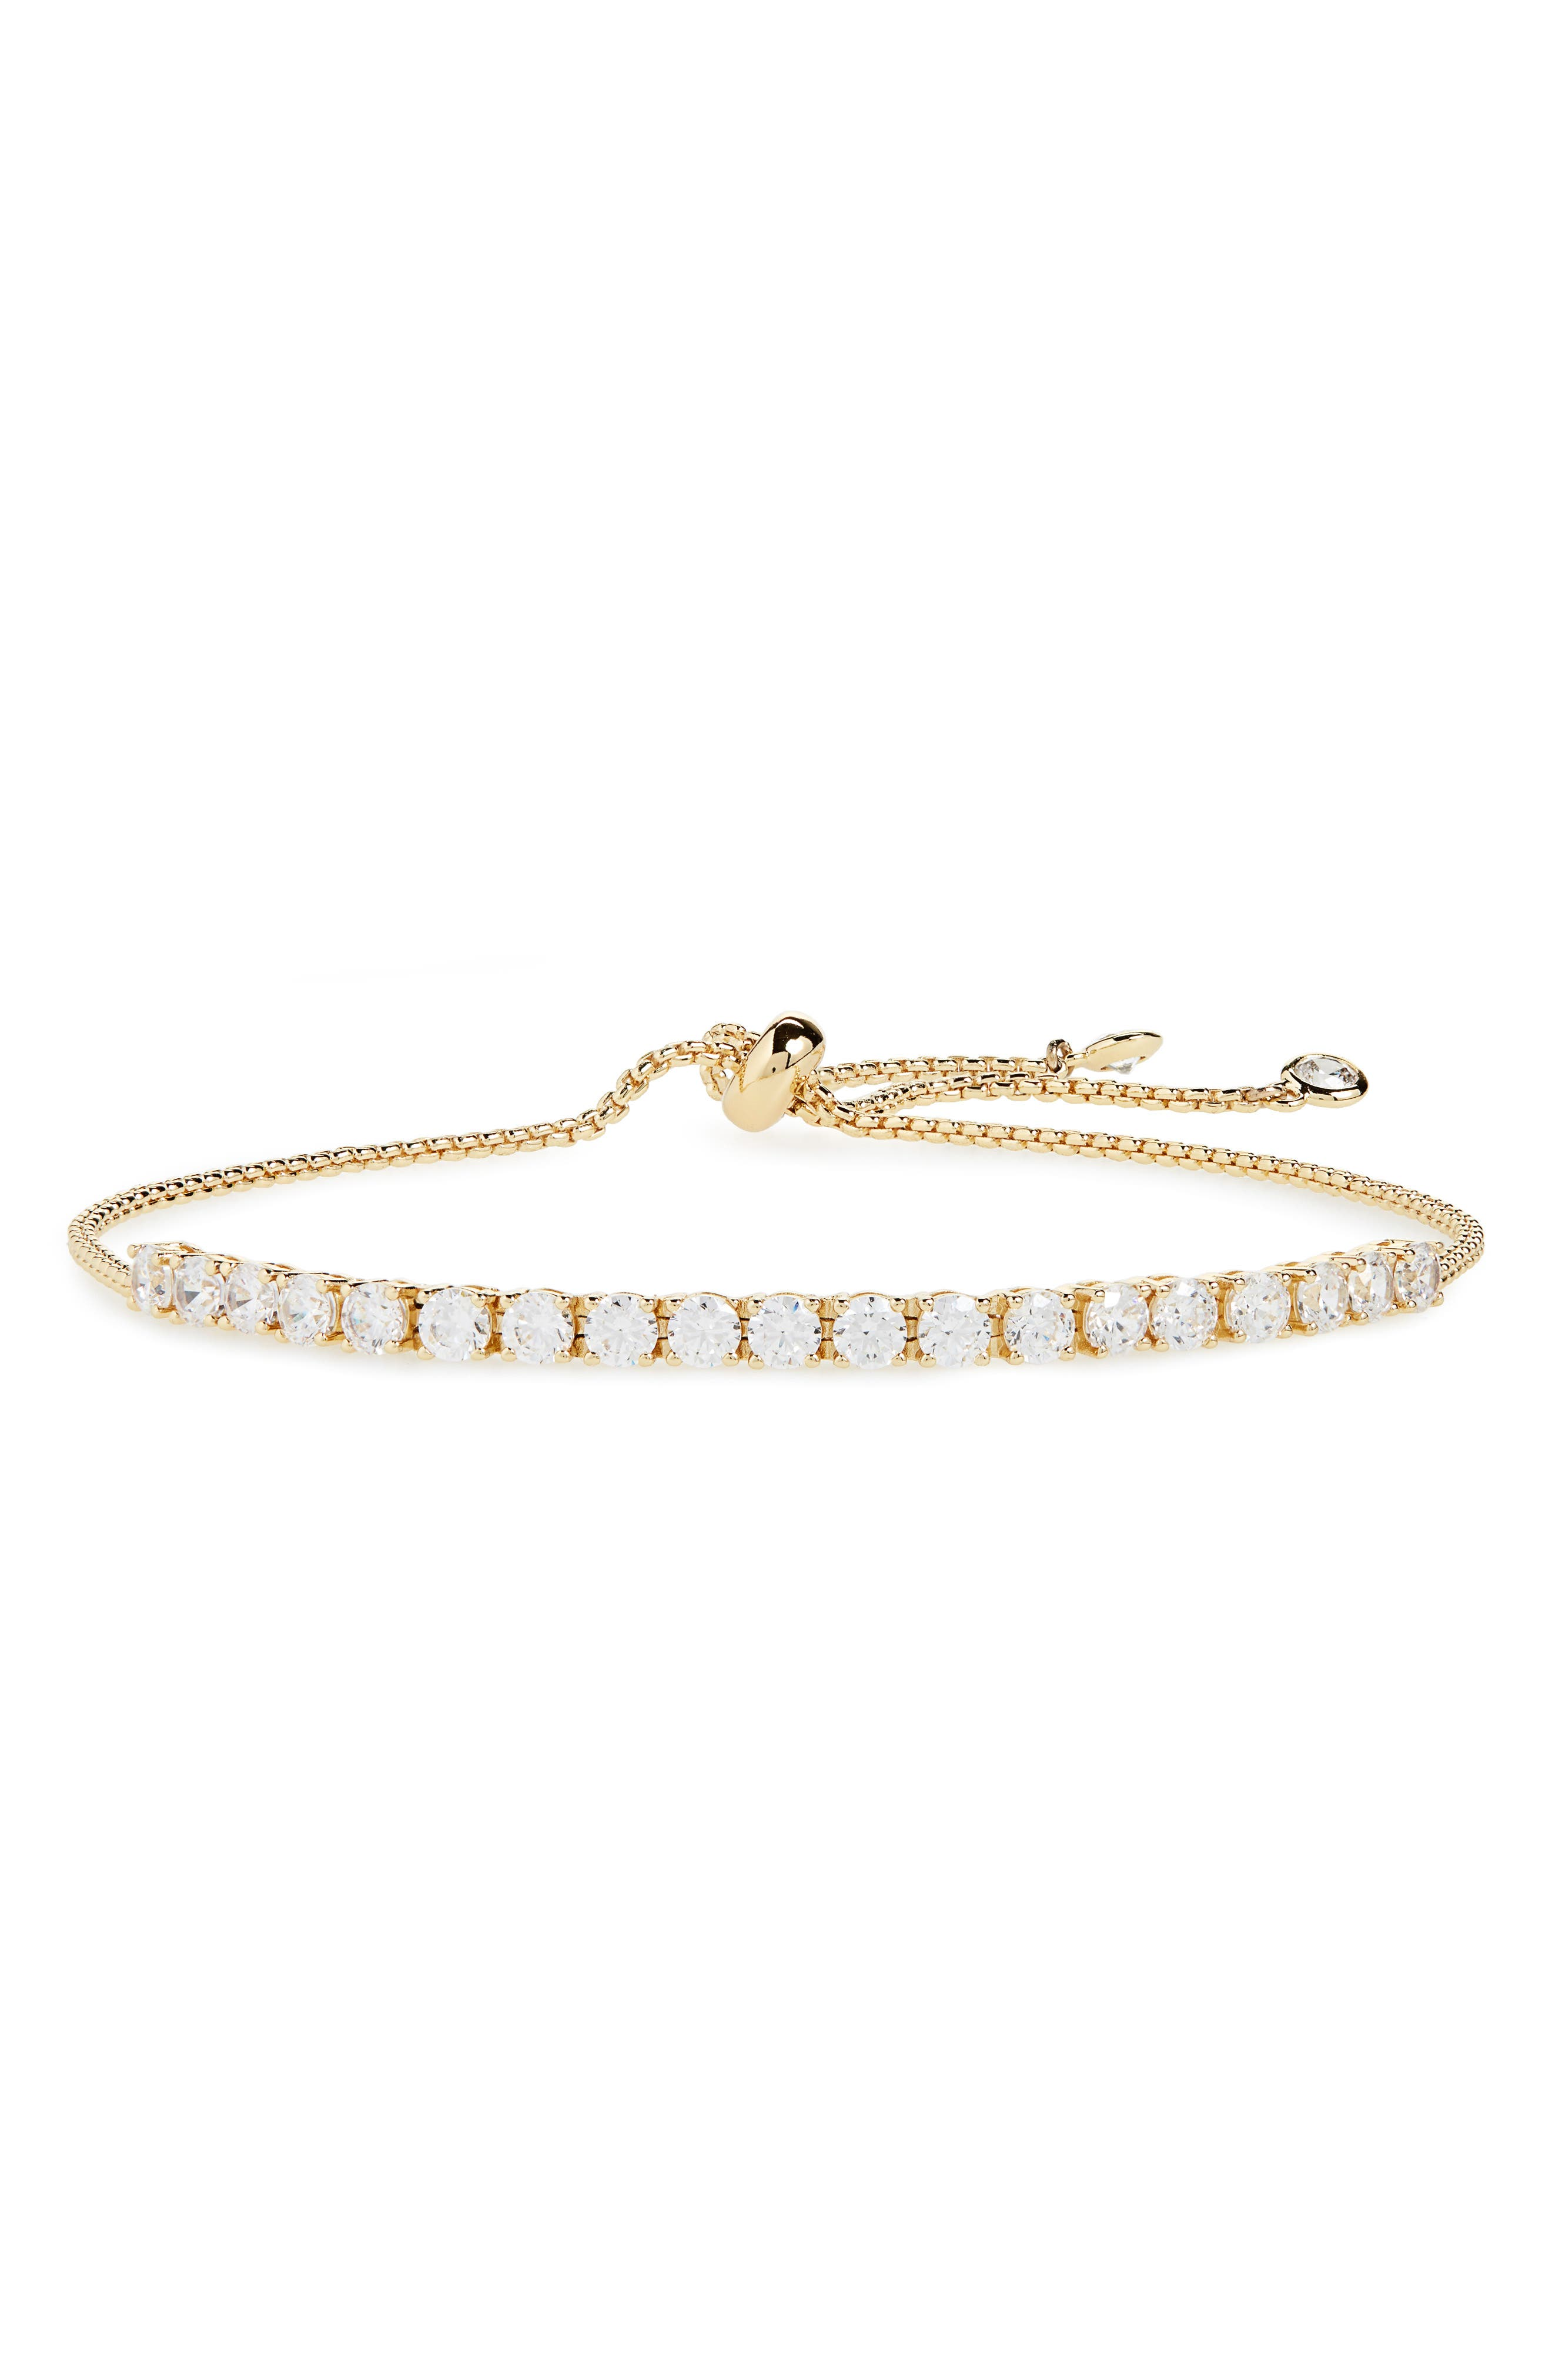 Pavé Spheres Tennis Slider Bracelet,                             Main thumbnail 1, color,                             CLEAR/ GOLD